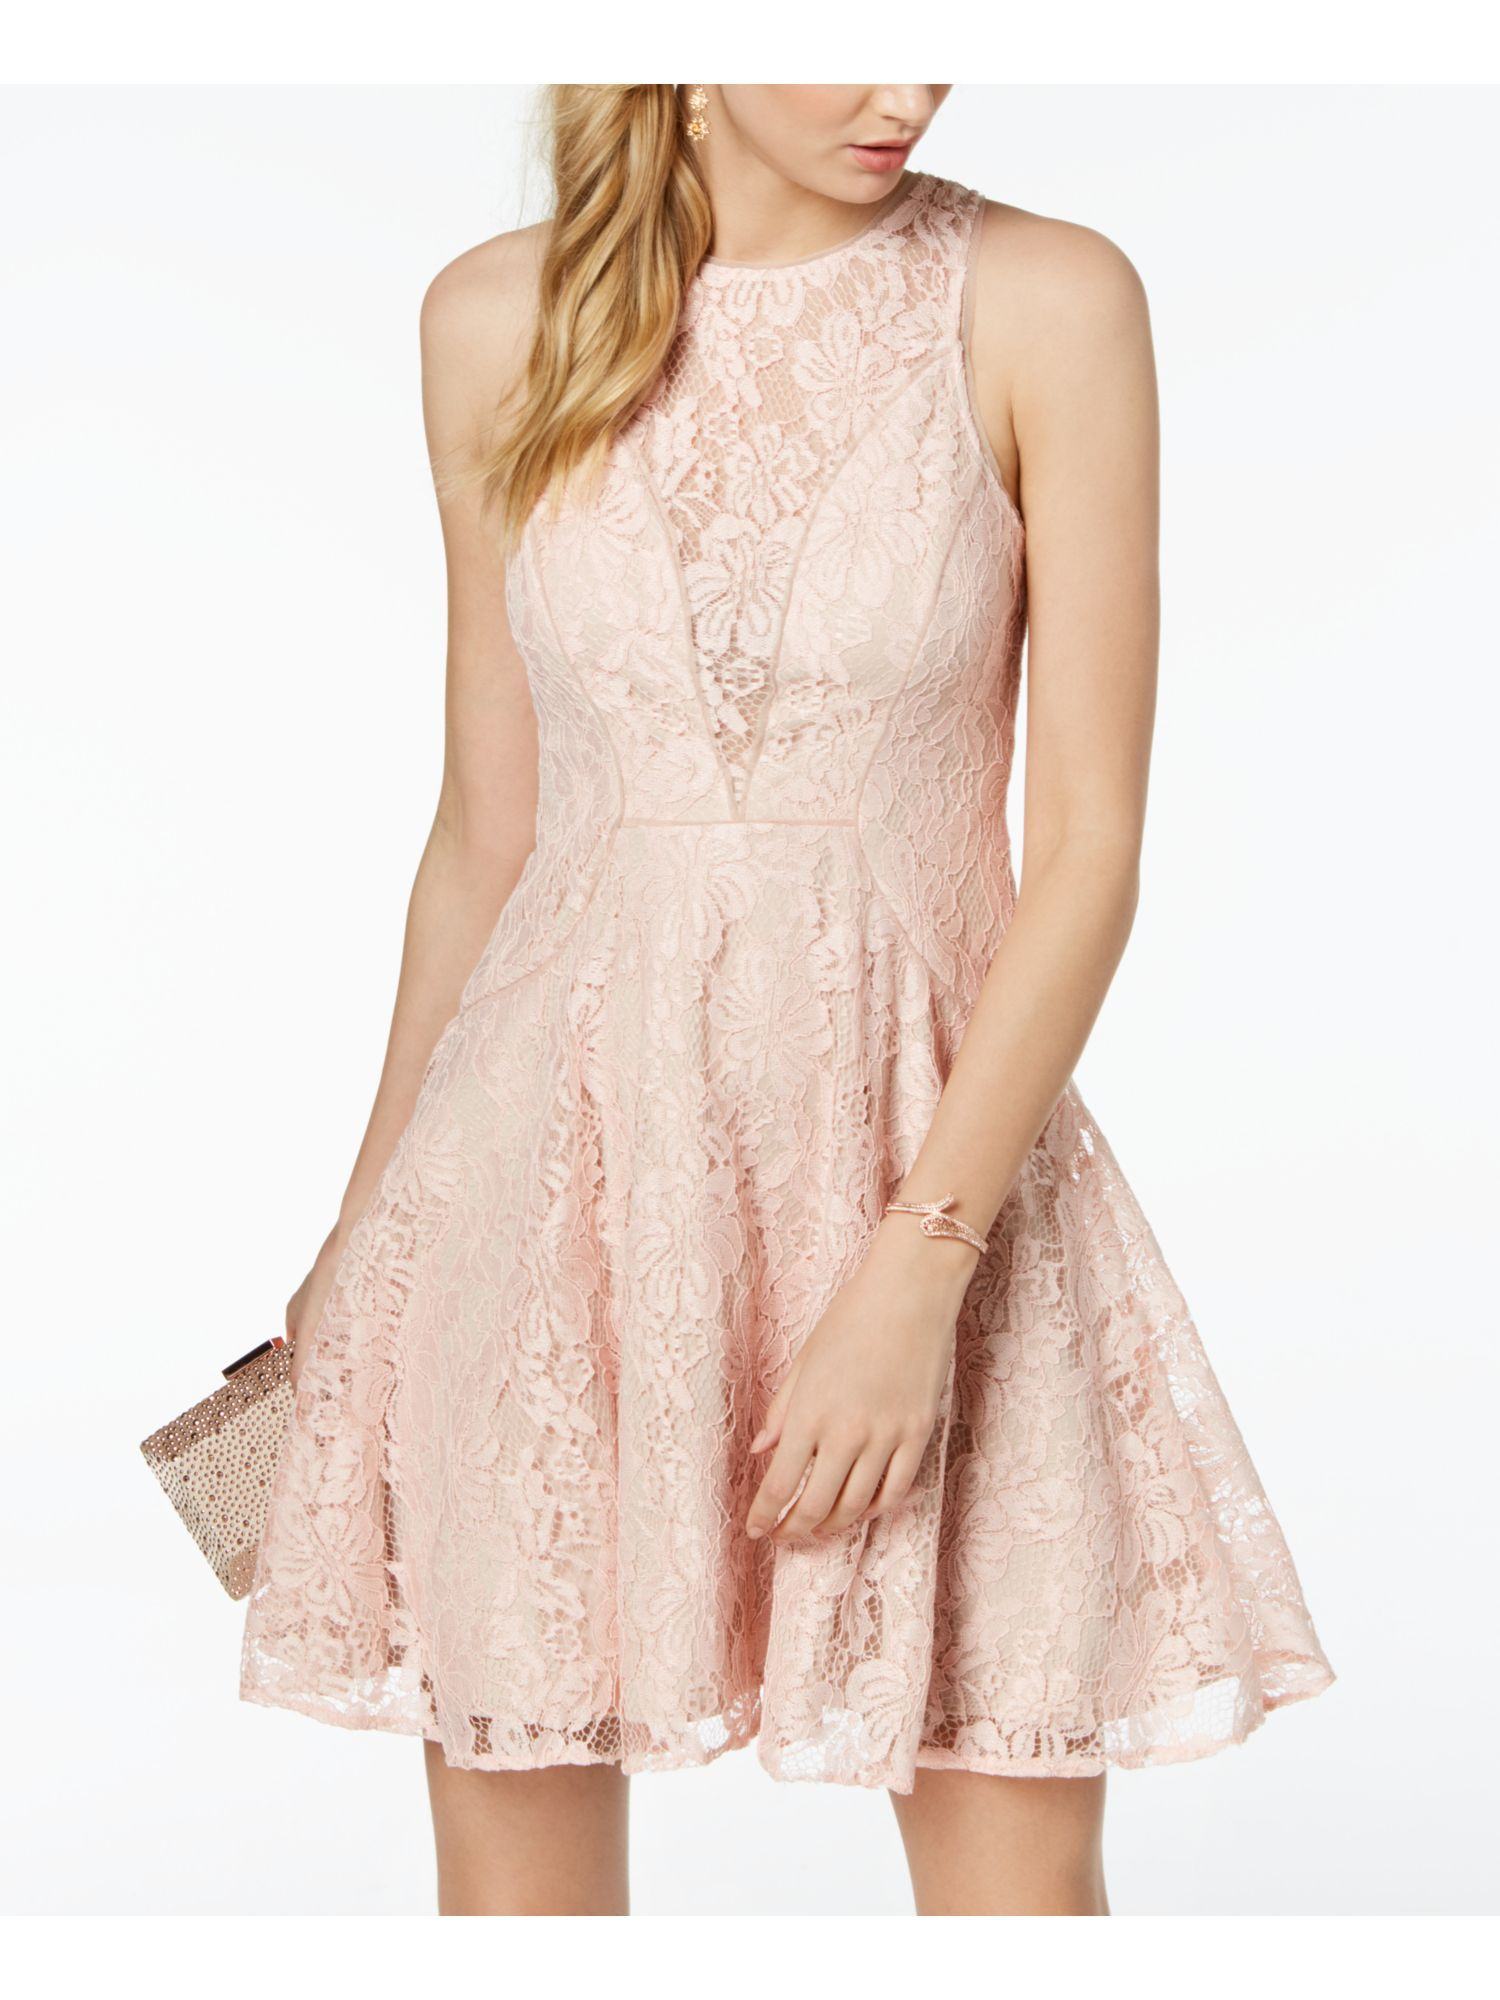 Xscape Xscape Womens Pink Lace Sleeveless Jewel Neck Mini Fit Flare Party Dress Size 10 Walmart Com Pink Ladies Dresses Clothes For Women [ 2000 x 1500 Pixel ]